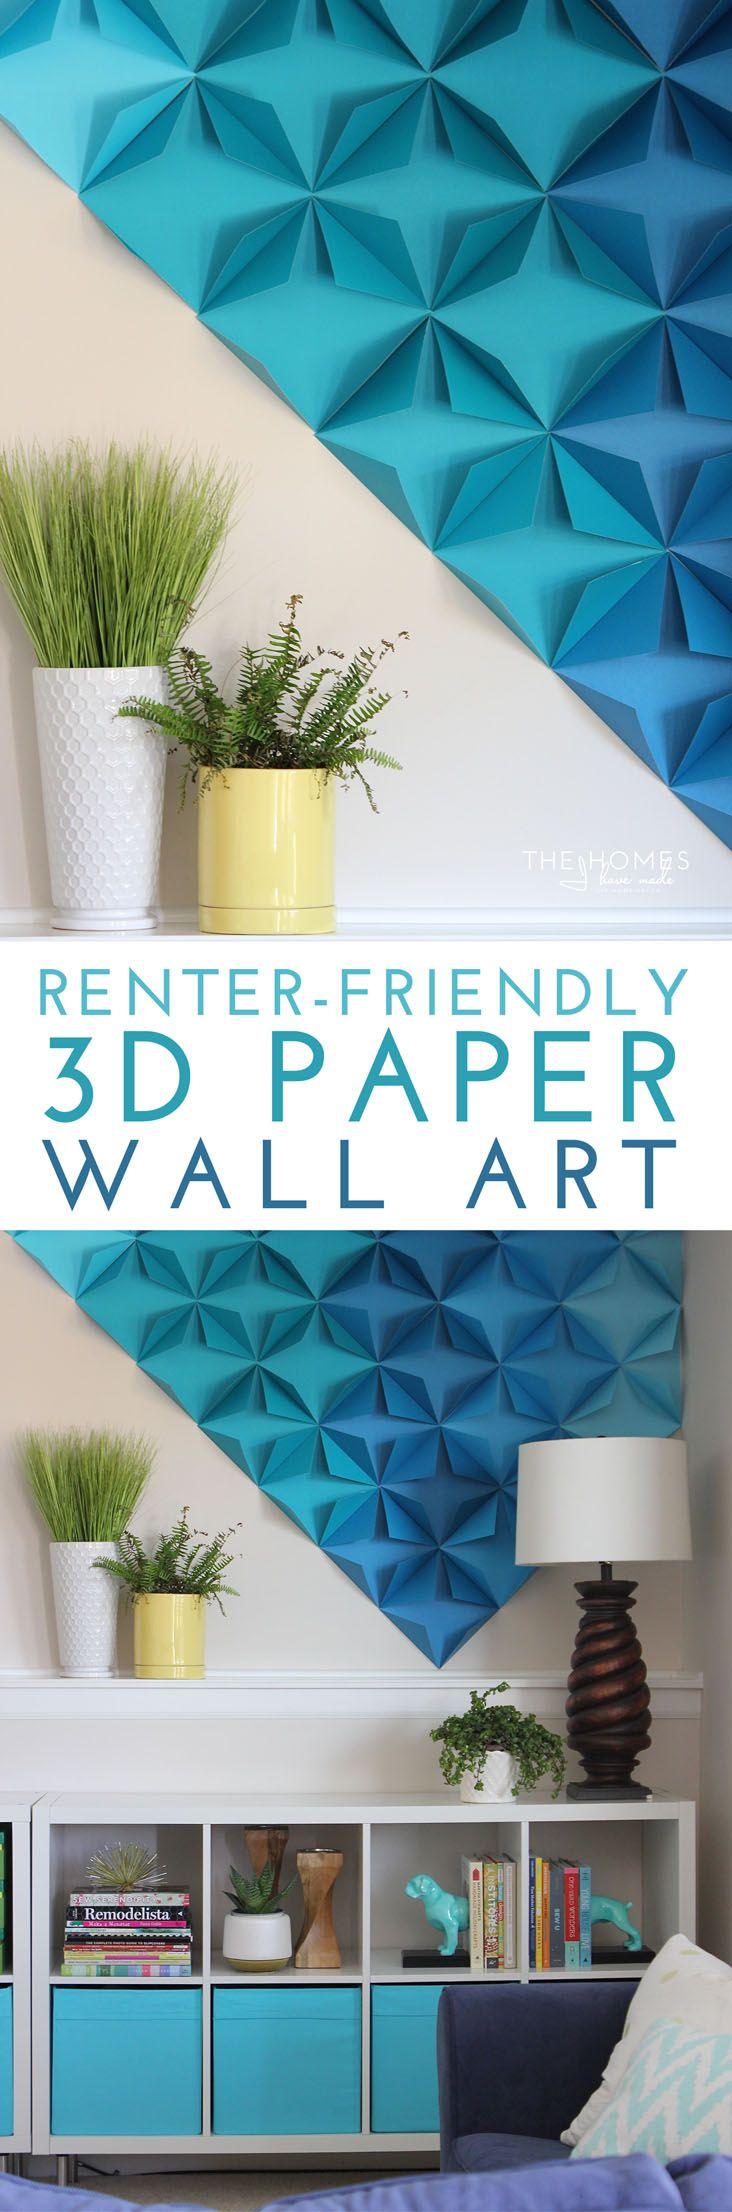 Renter Friendly 3d Paper Wall Art Tips Forrent Paper Wall Art Origami Wall Art Diy Wall Art